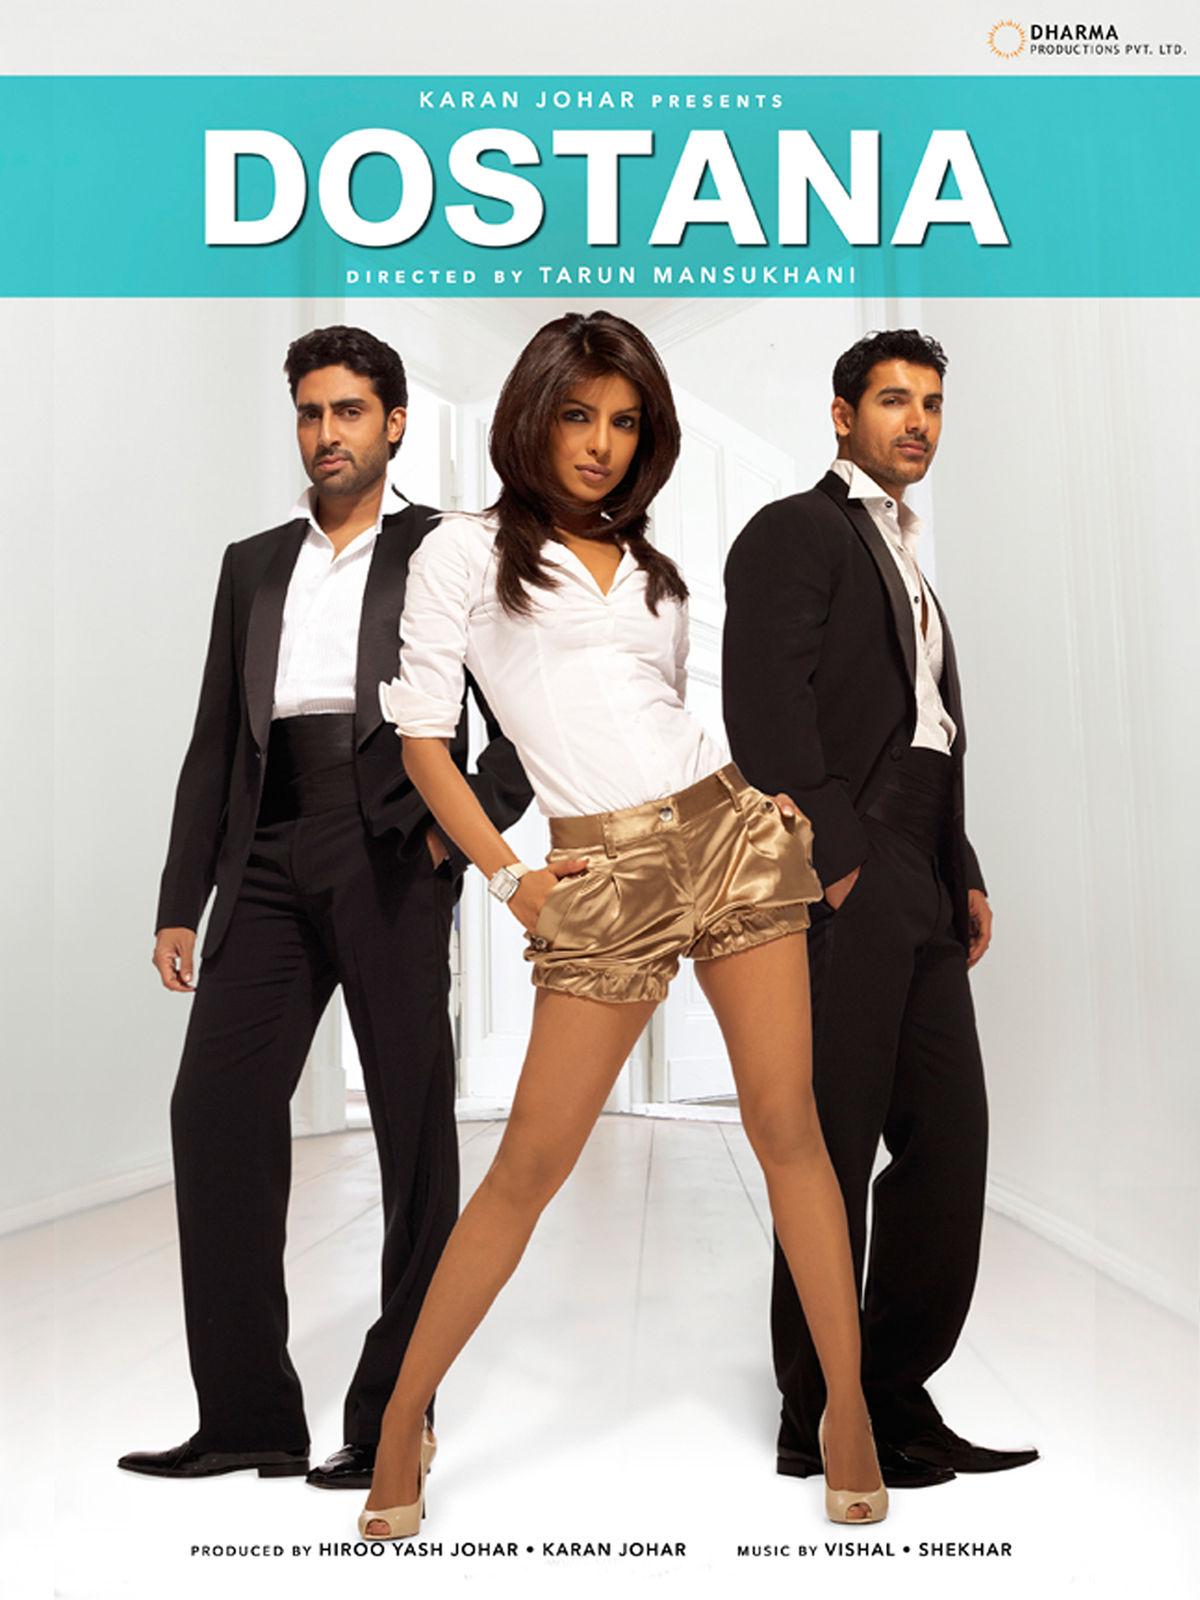 Boman Irani Best Movies, TV Shows and Web Series List